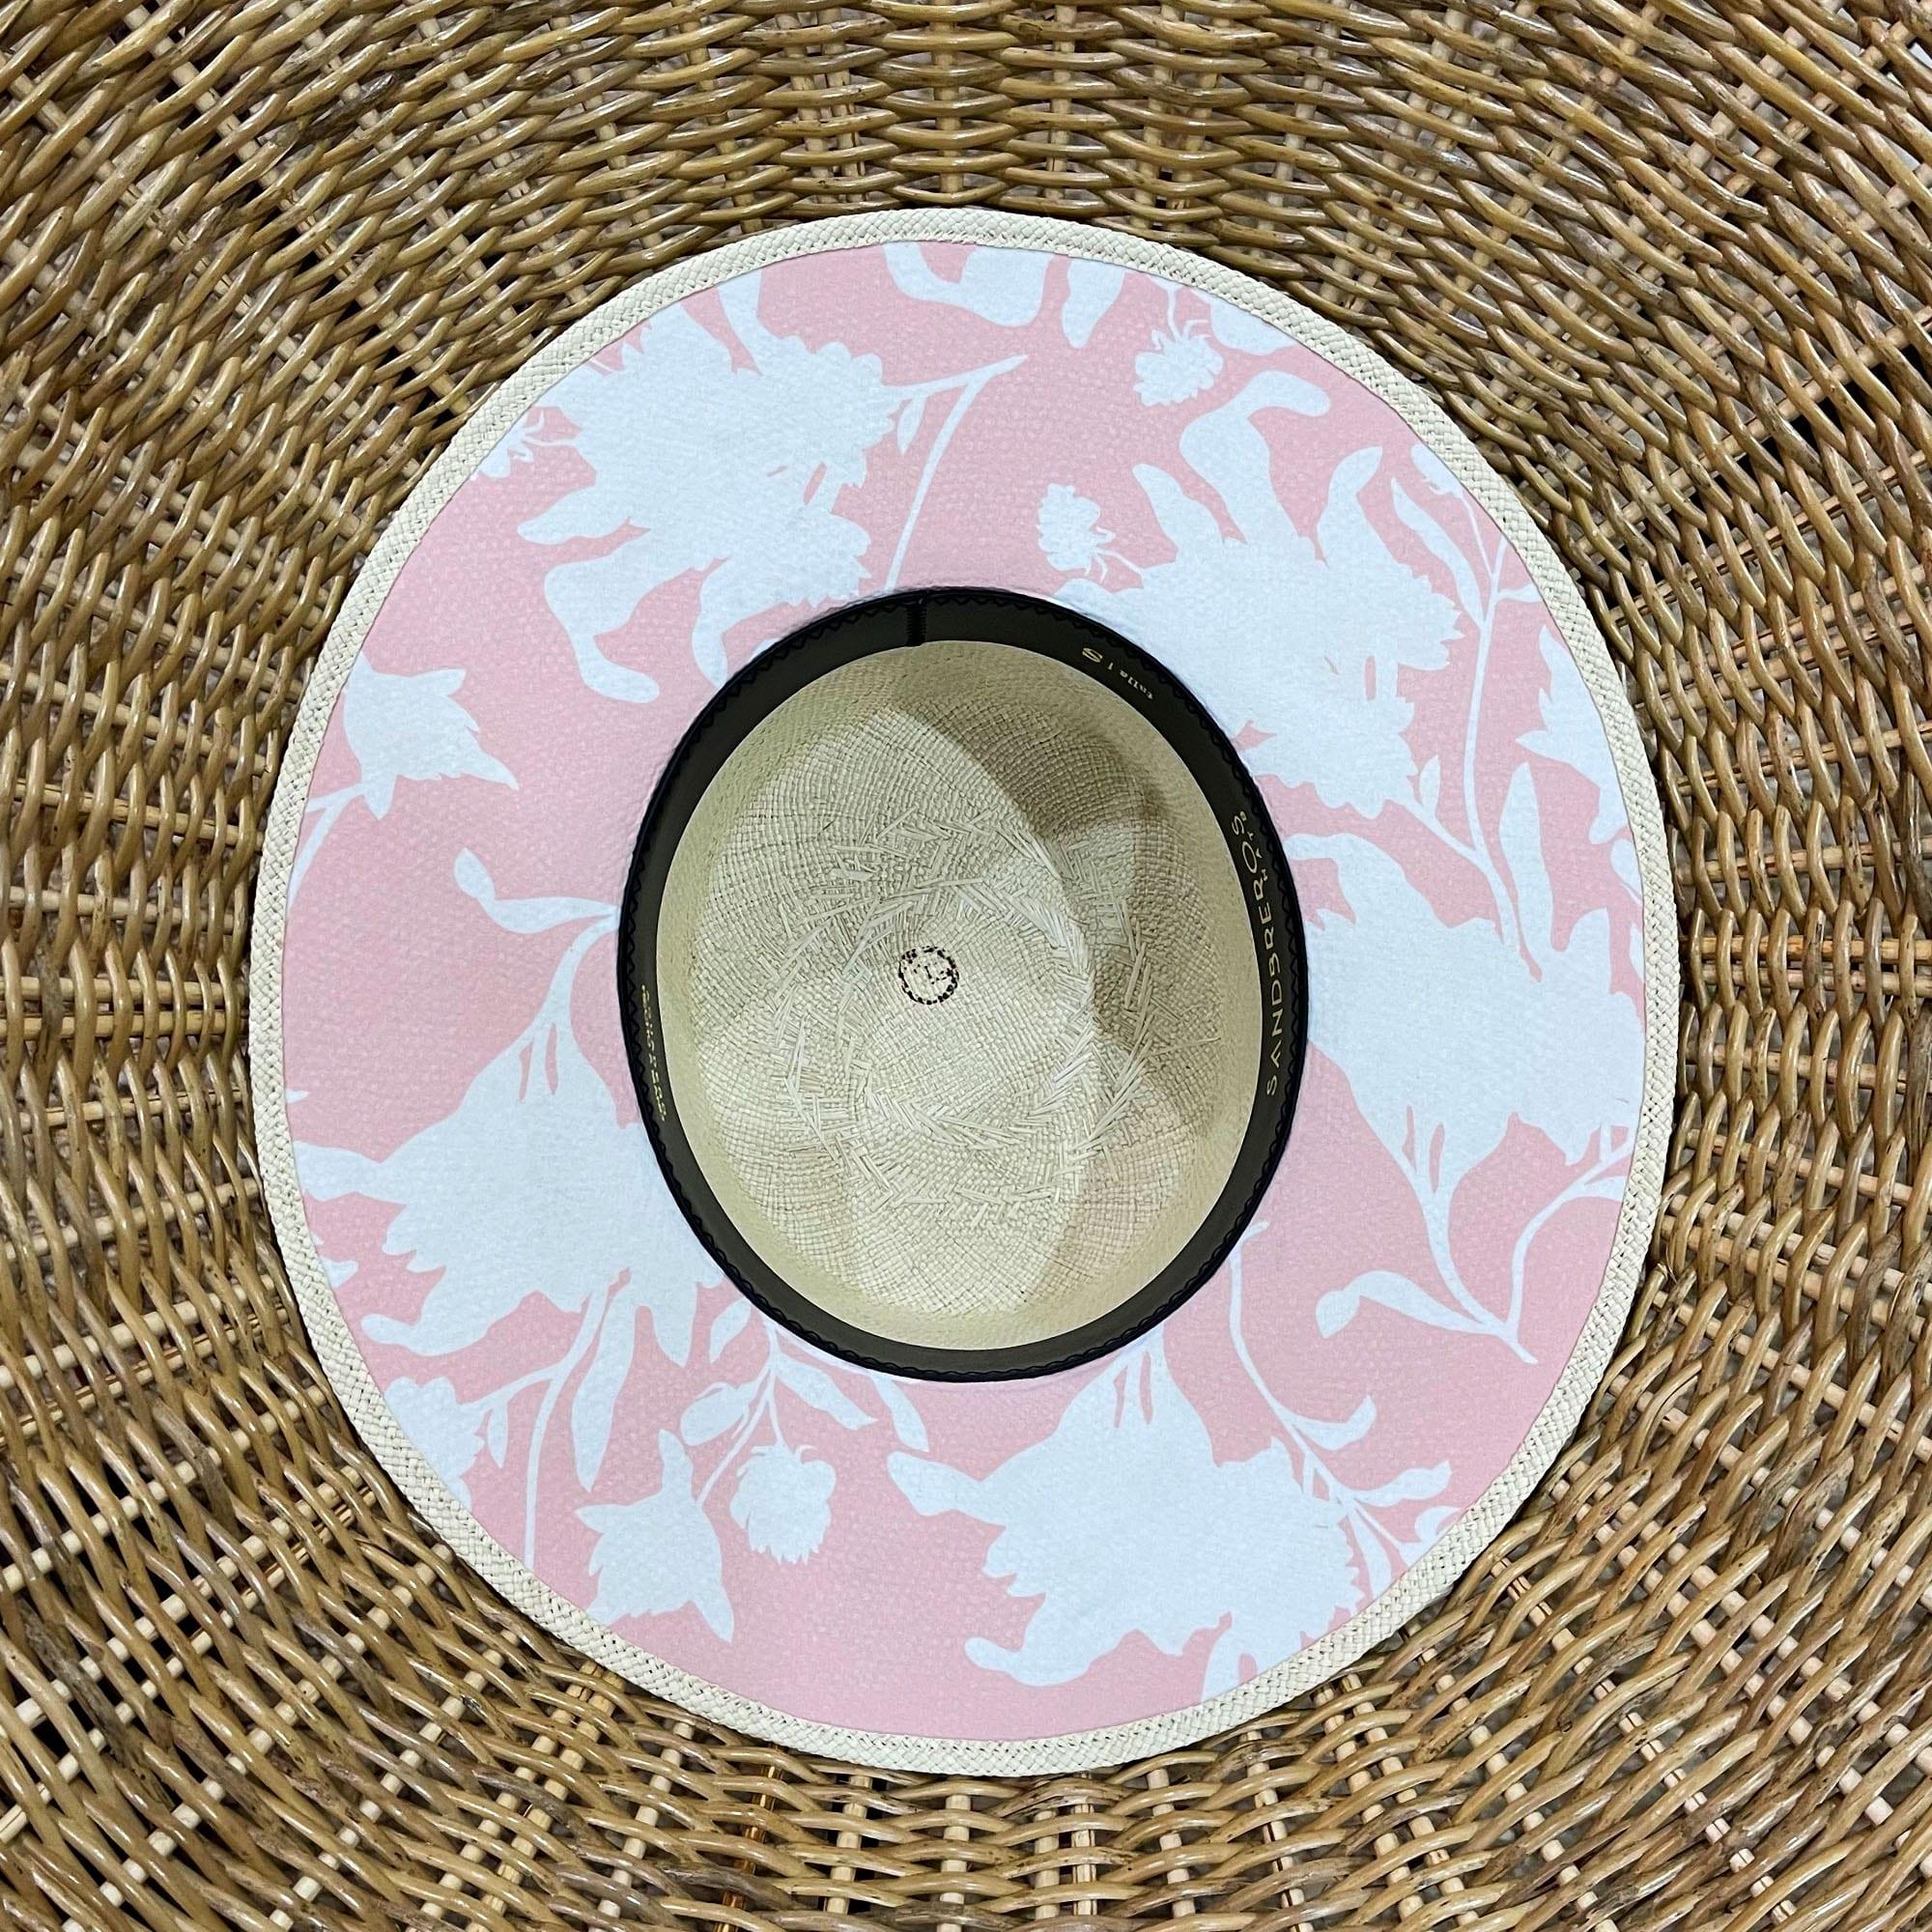 cordobes de paja natural extrafina con tela debajo del ala rosada